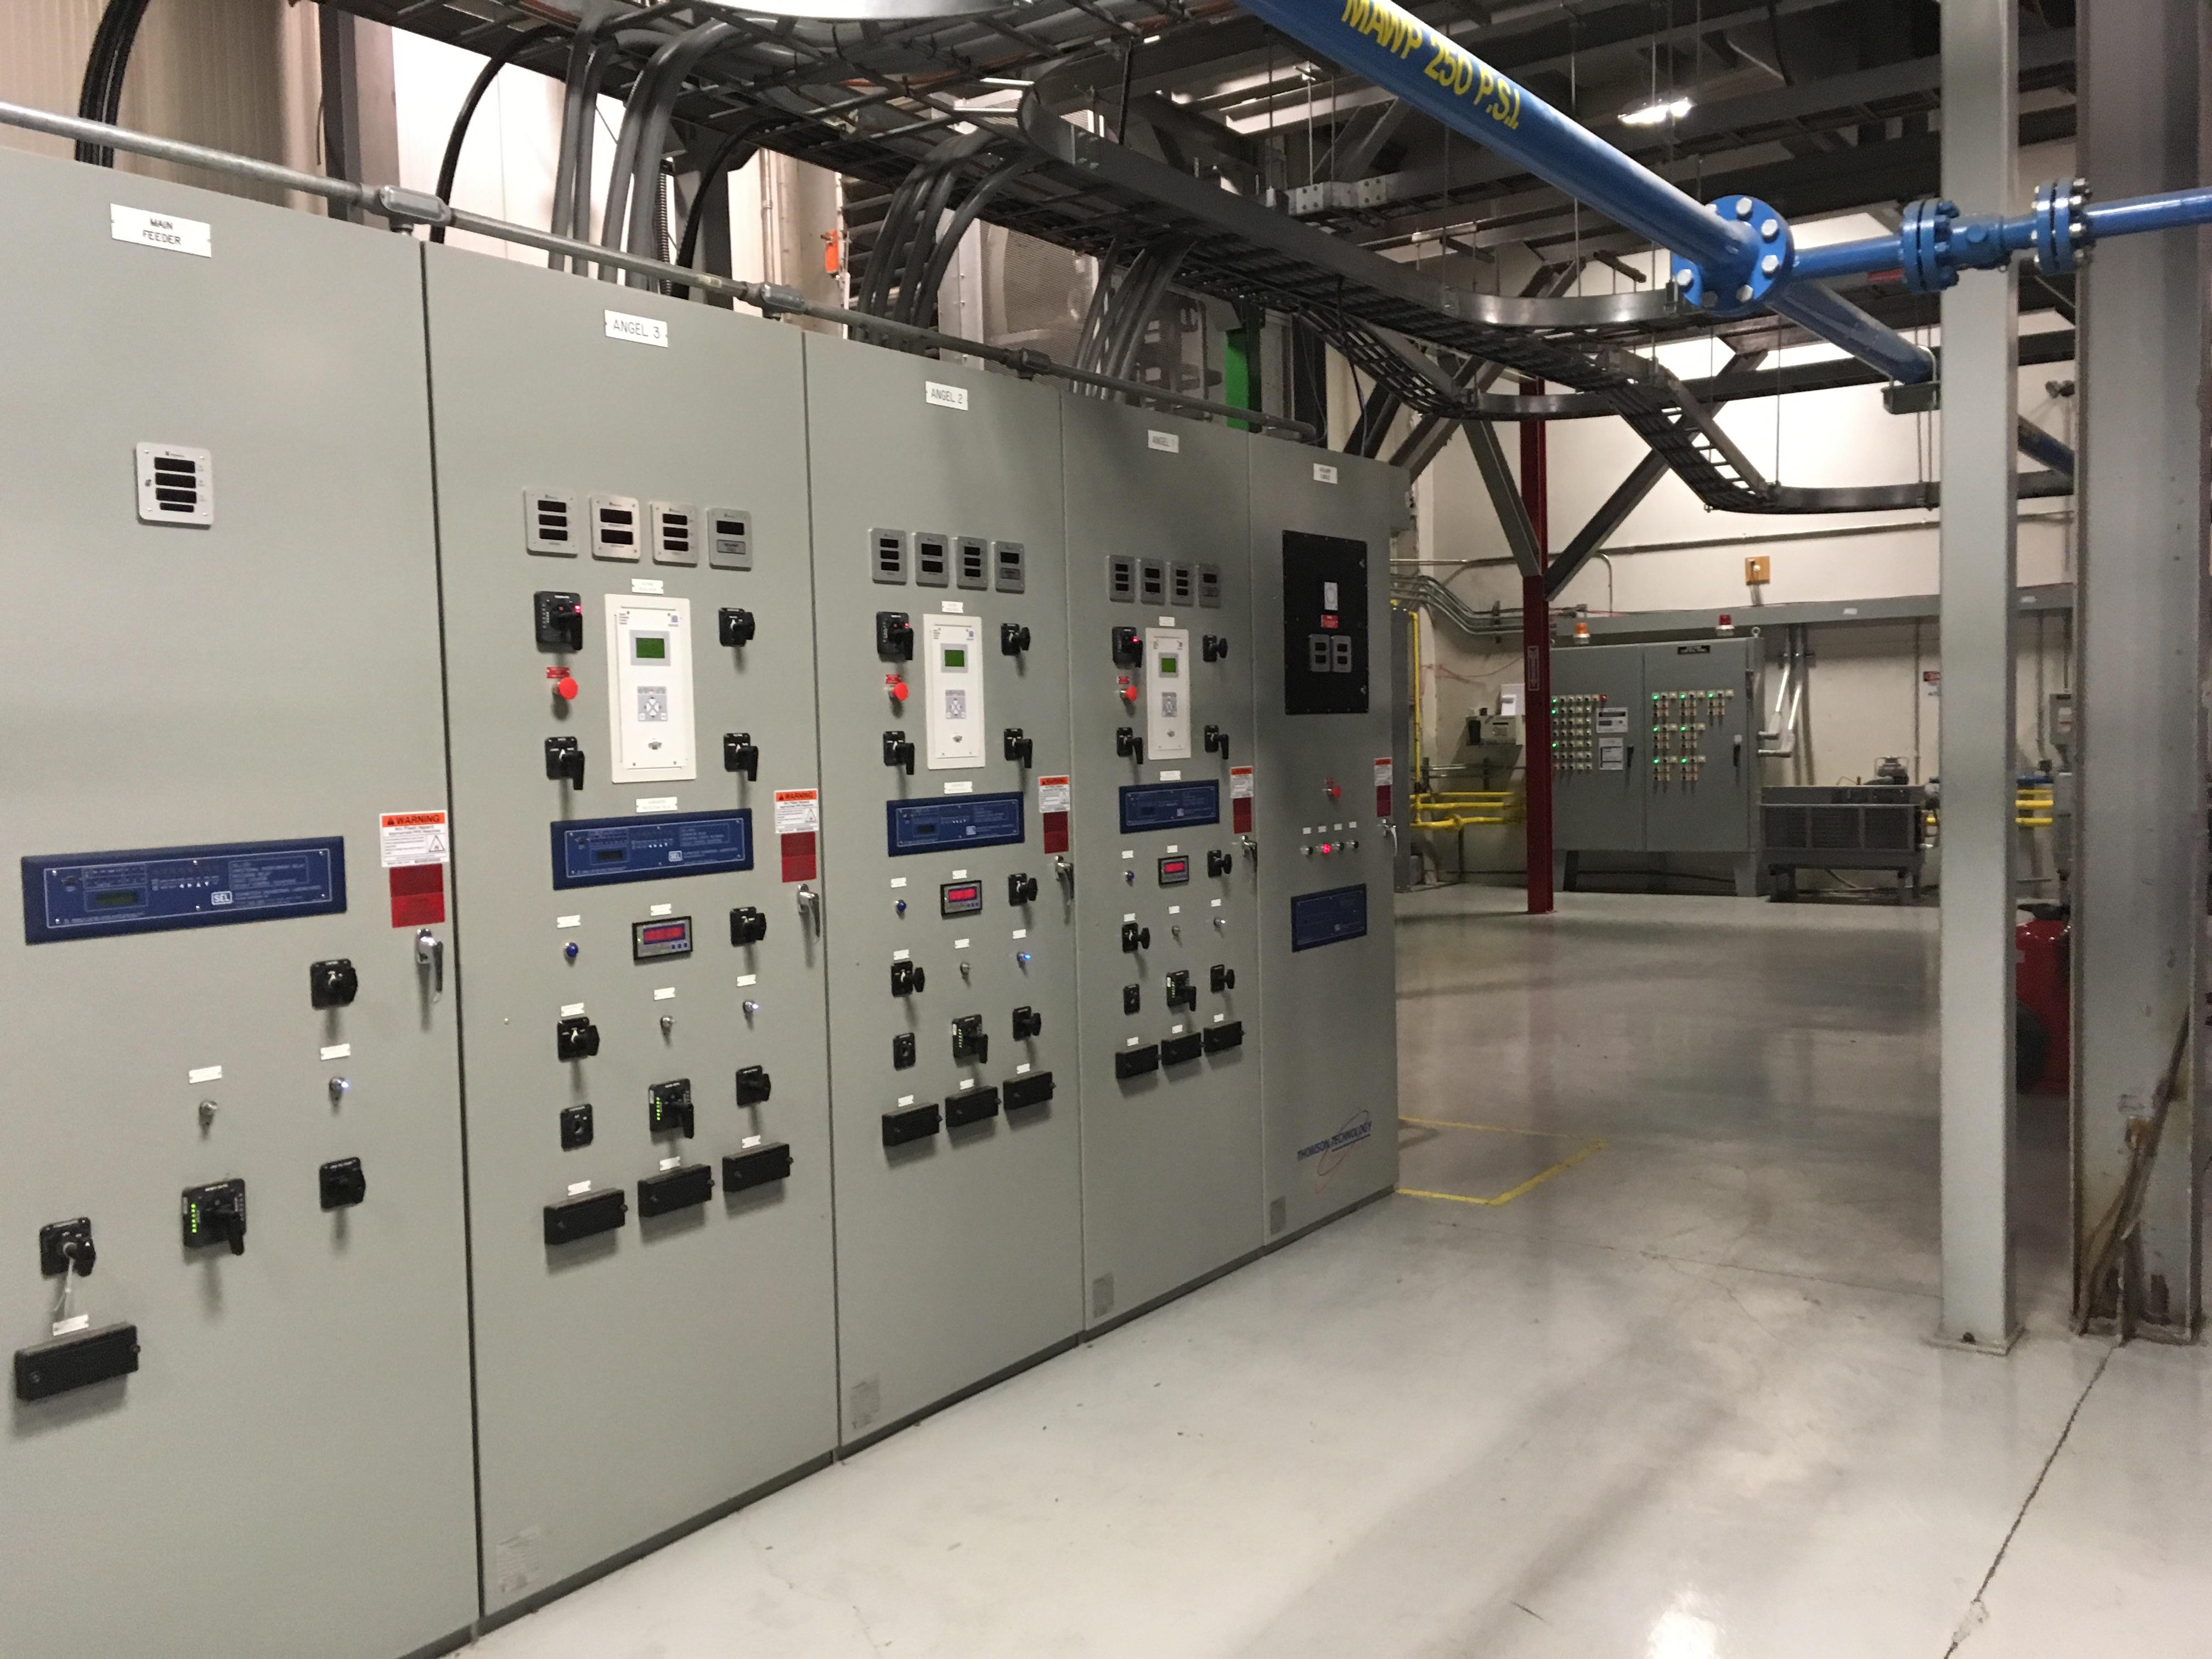 File:HAARP Generator Room Panel.jpg - Wikimedia Commons